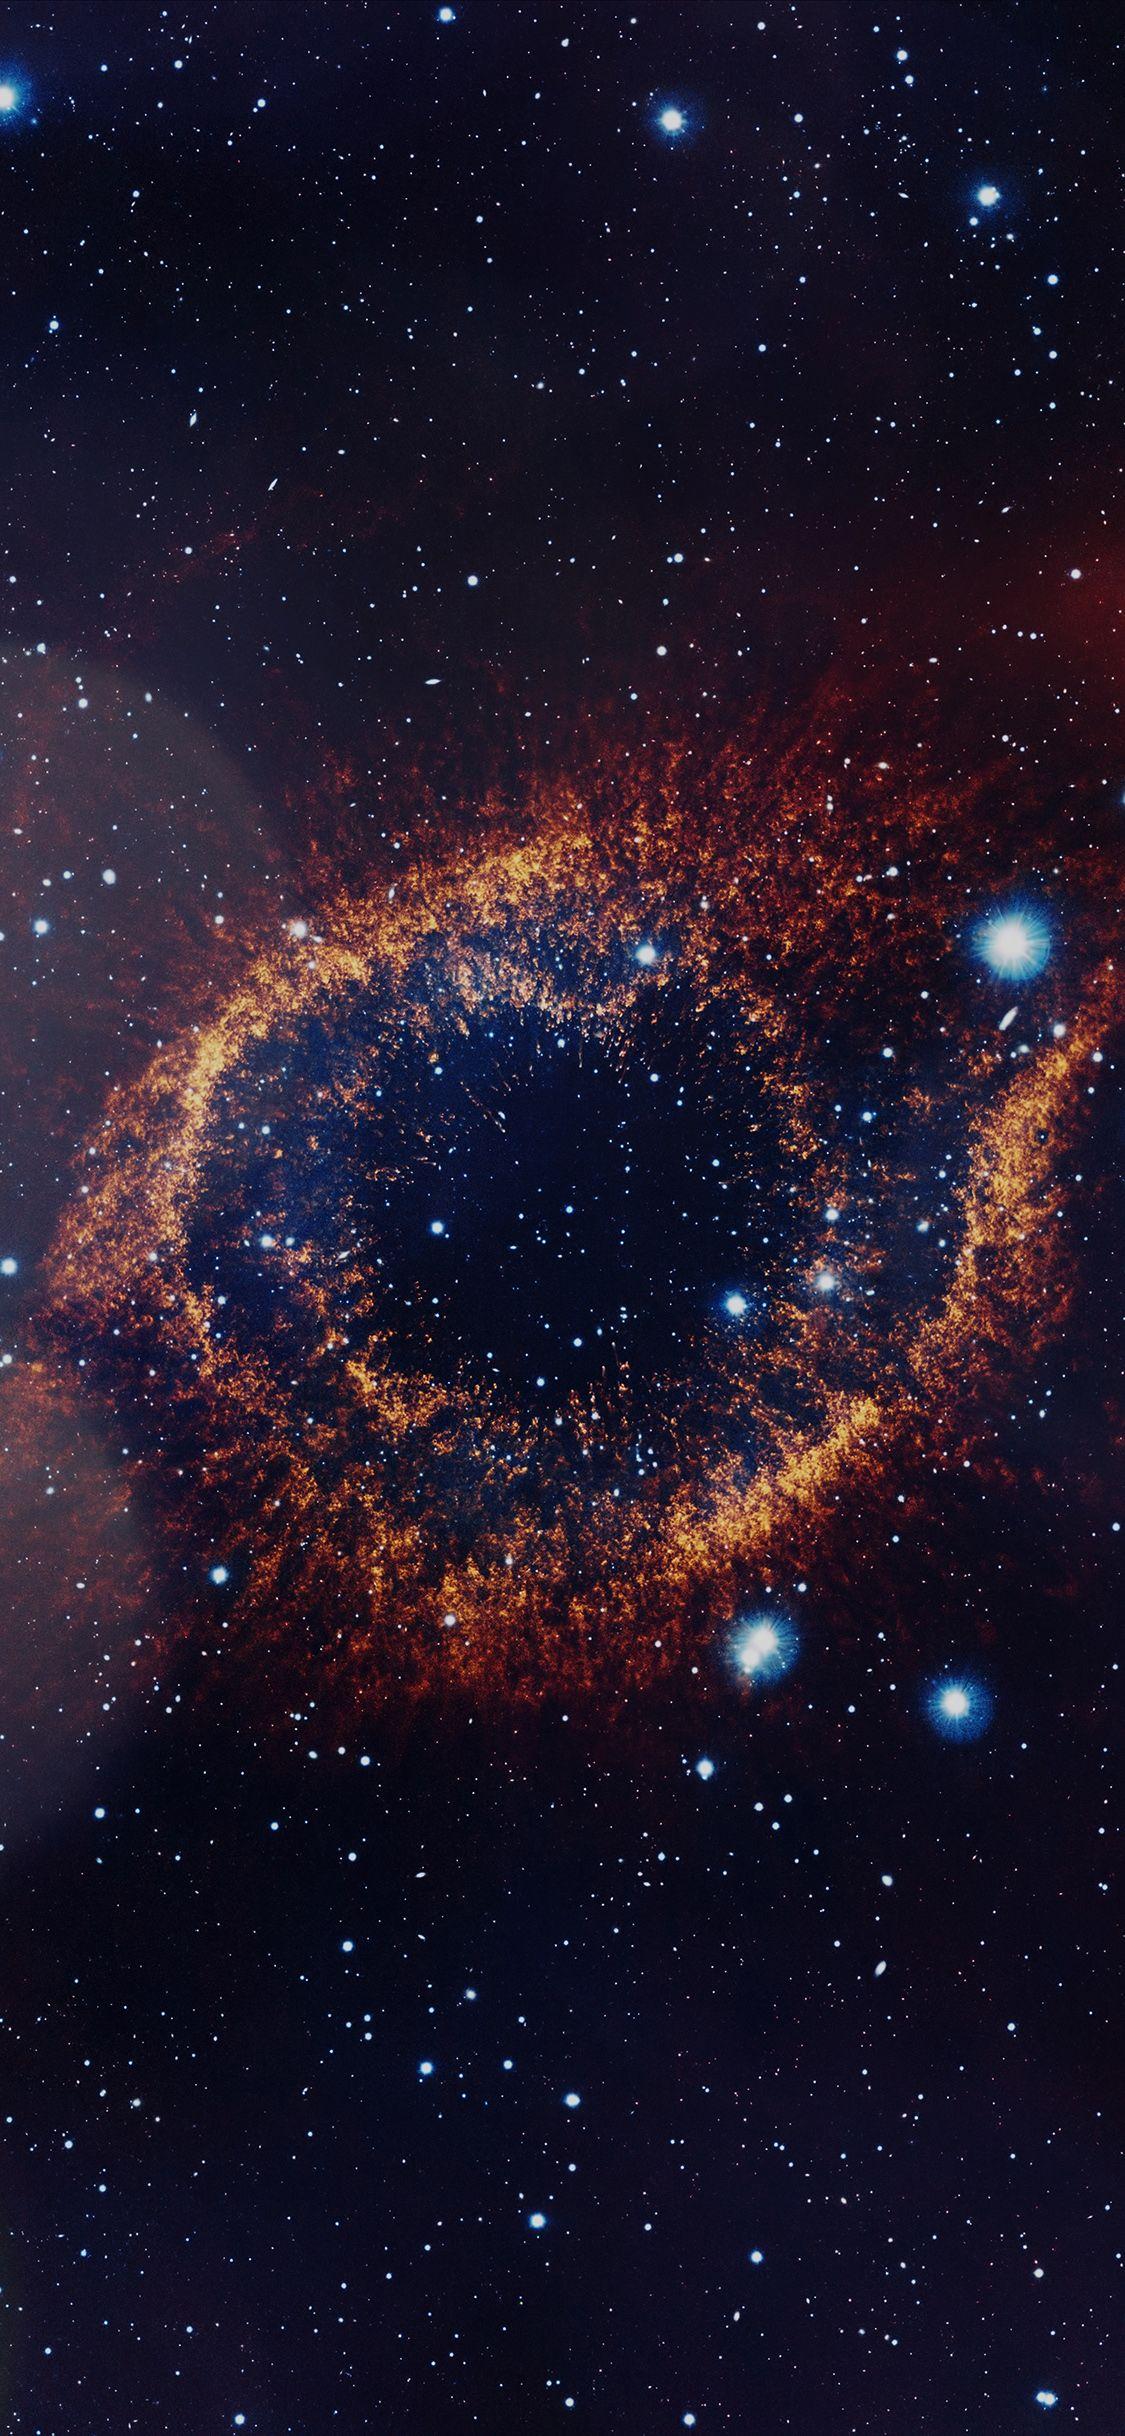 Space Star Wallpaper Iphone Wallpaper Stars Eyes Wallpaper Iphone Wallpaper Eyes